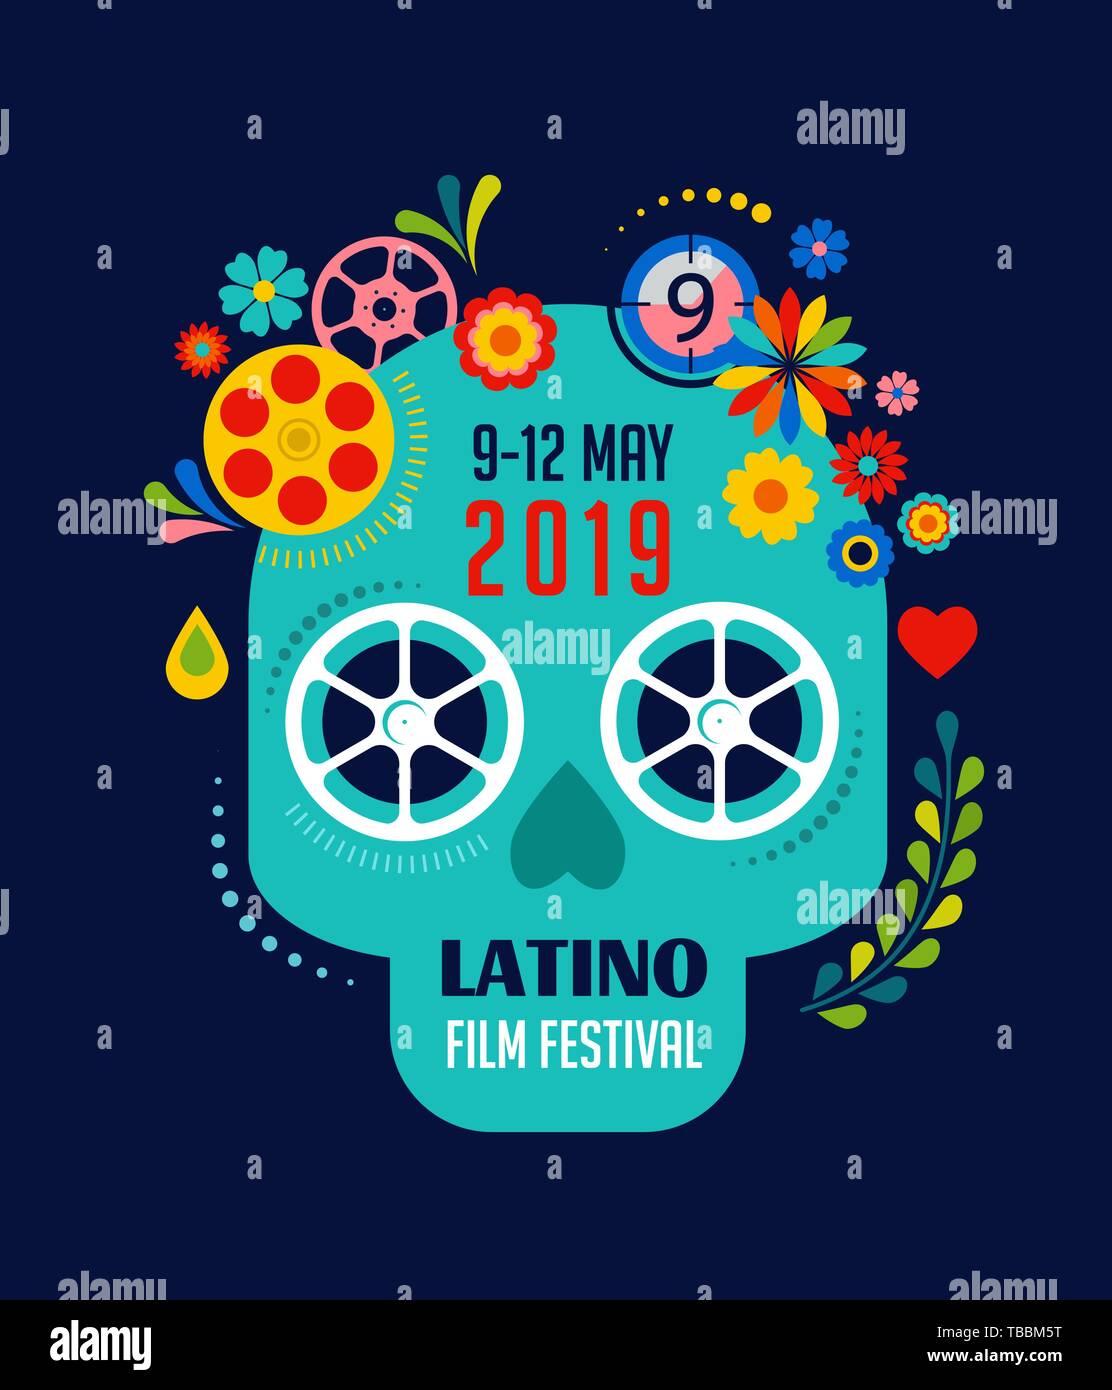 Film Festival Cinema And Movie Poster Template Creative